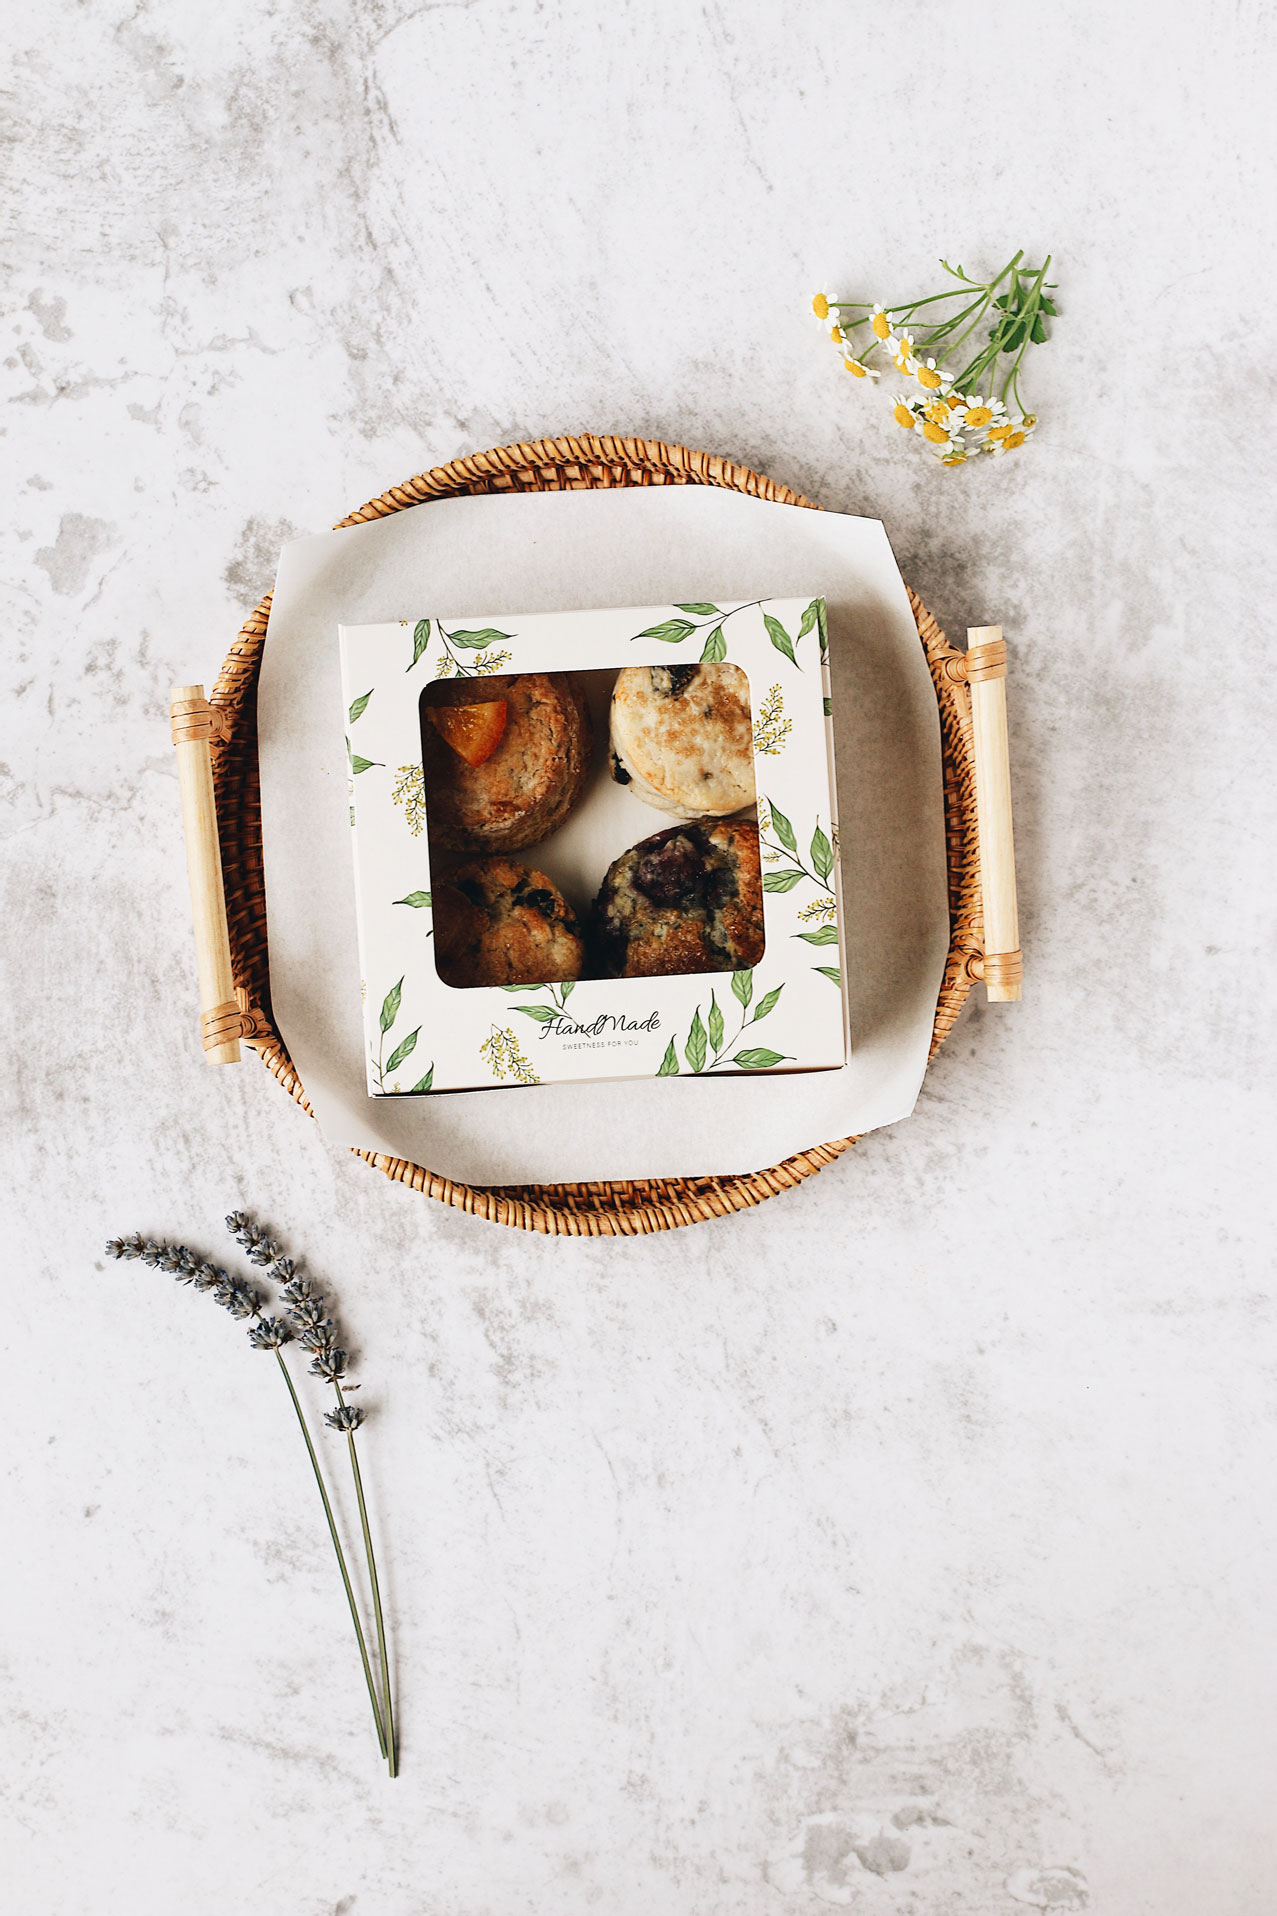 good-day-baking-co-mini-scone-sampler-3